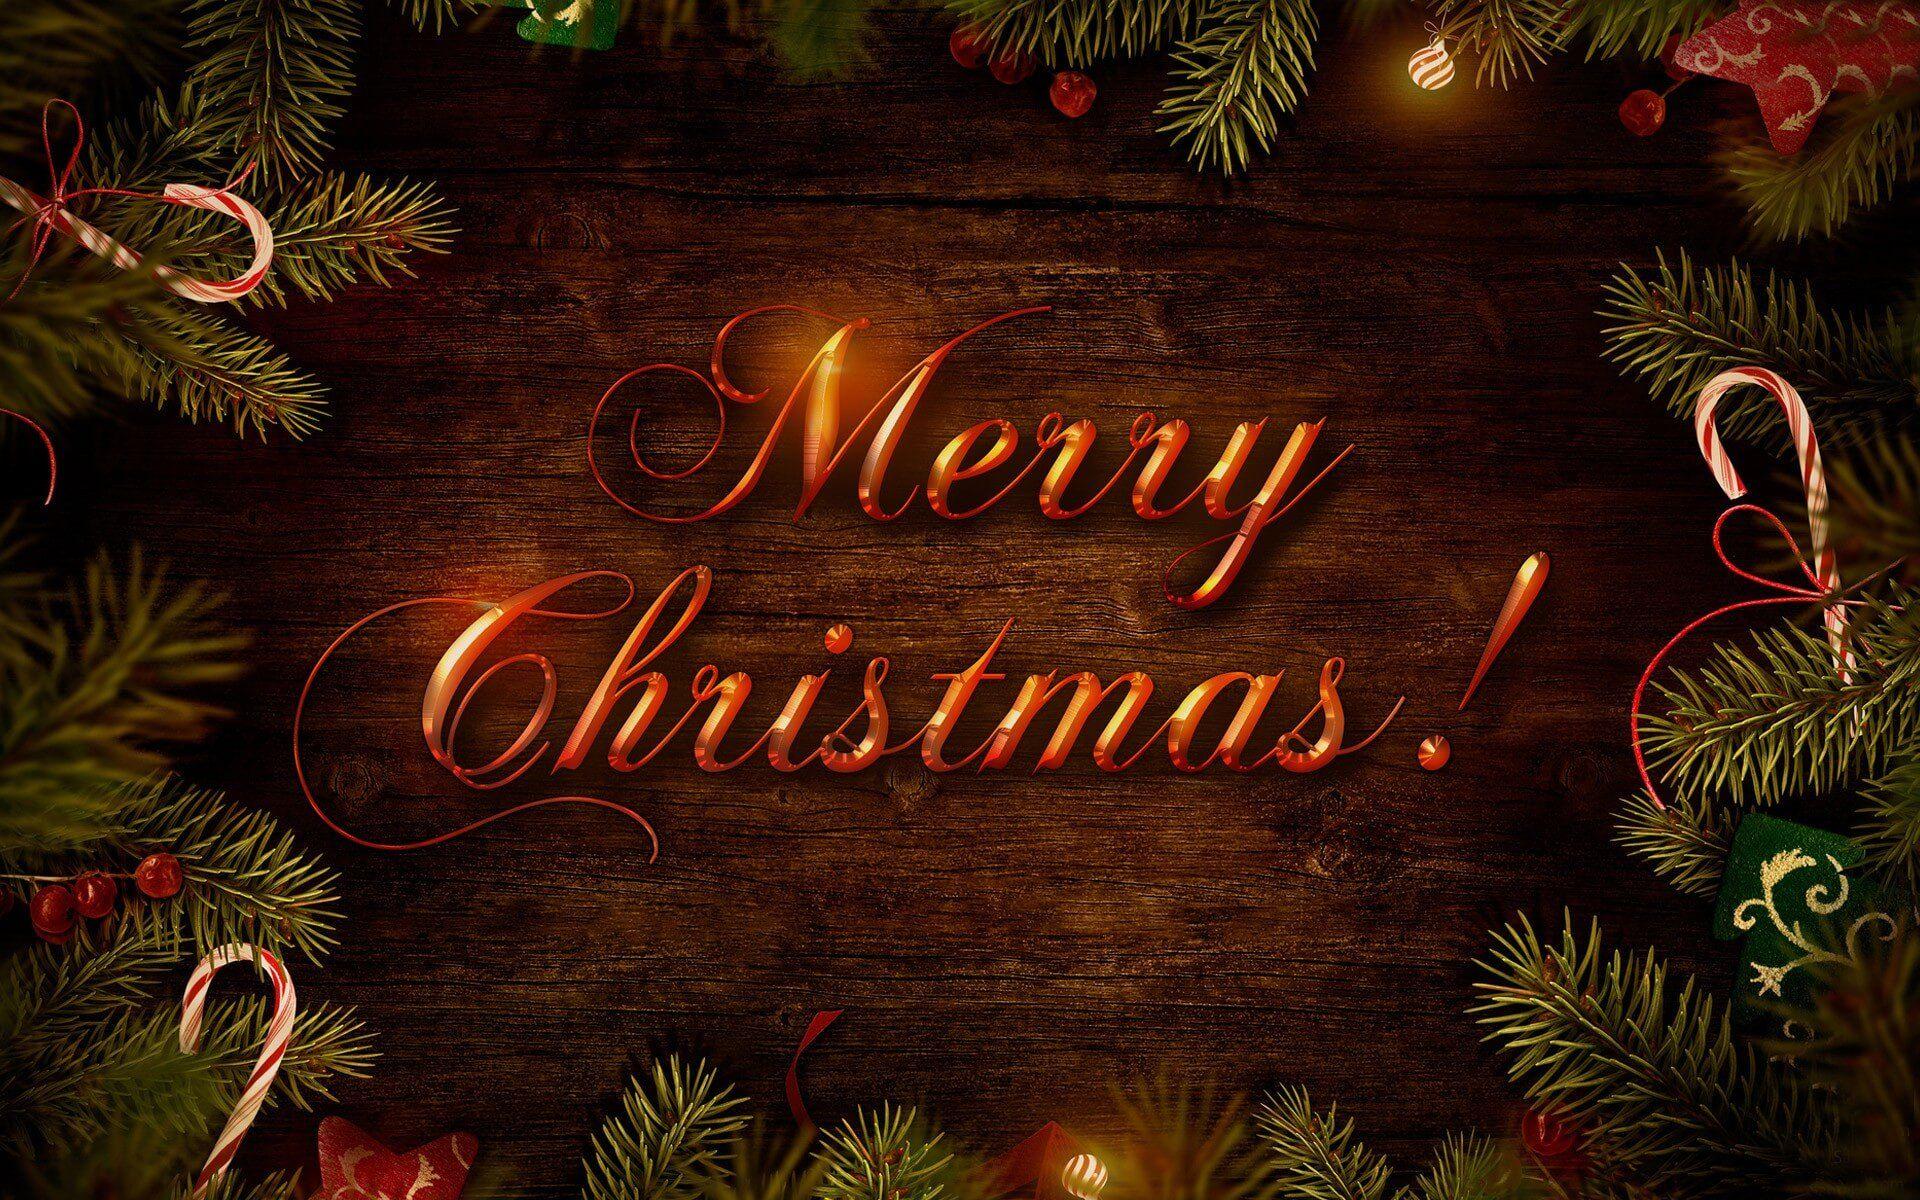 Christmas Whatsapp Status Merry Christmas Quotes Christmas Hd Images Funny Christmas Wa Merry Christmas Wallpaper Christmas Desktop Merry Christmas Images Free